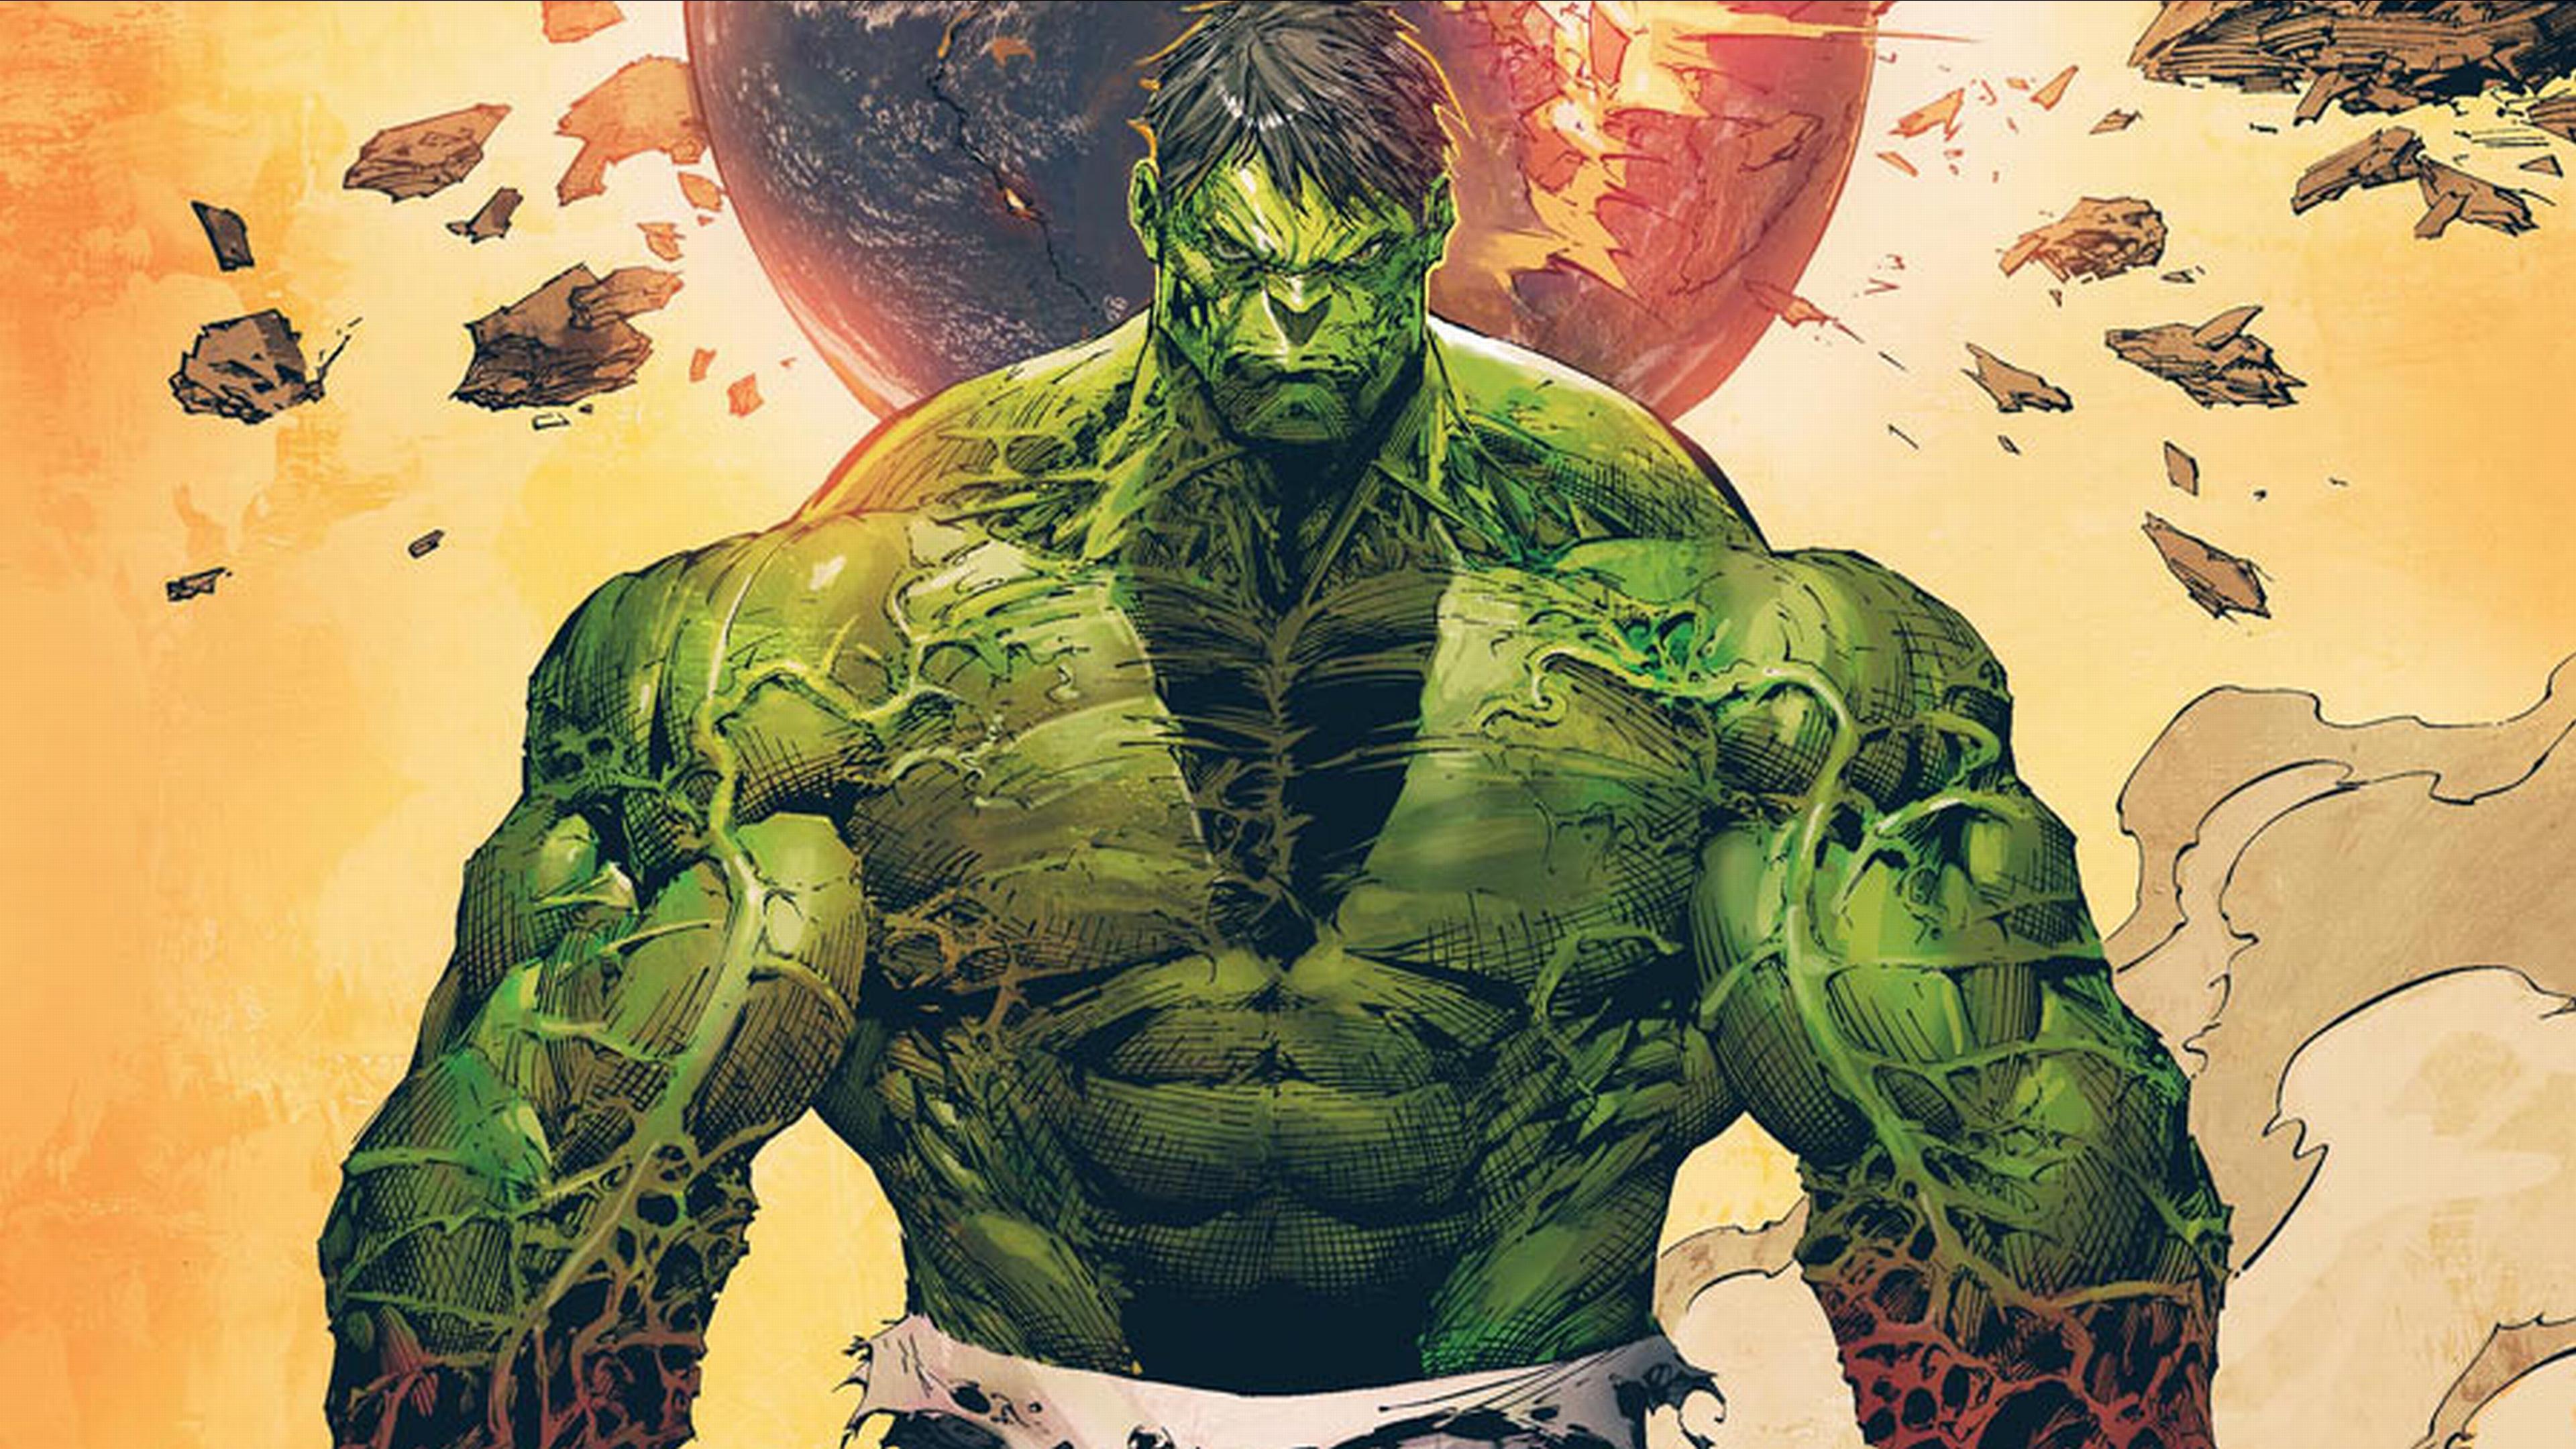 Hulk fonds d 39 cran arri res plan 3840x2160 id 160301 - Telecharger hulk ...